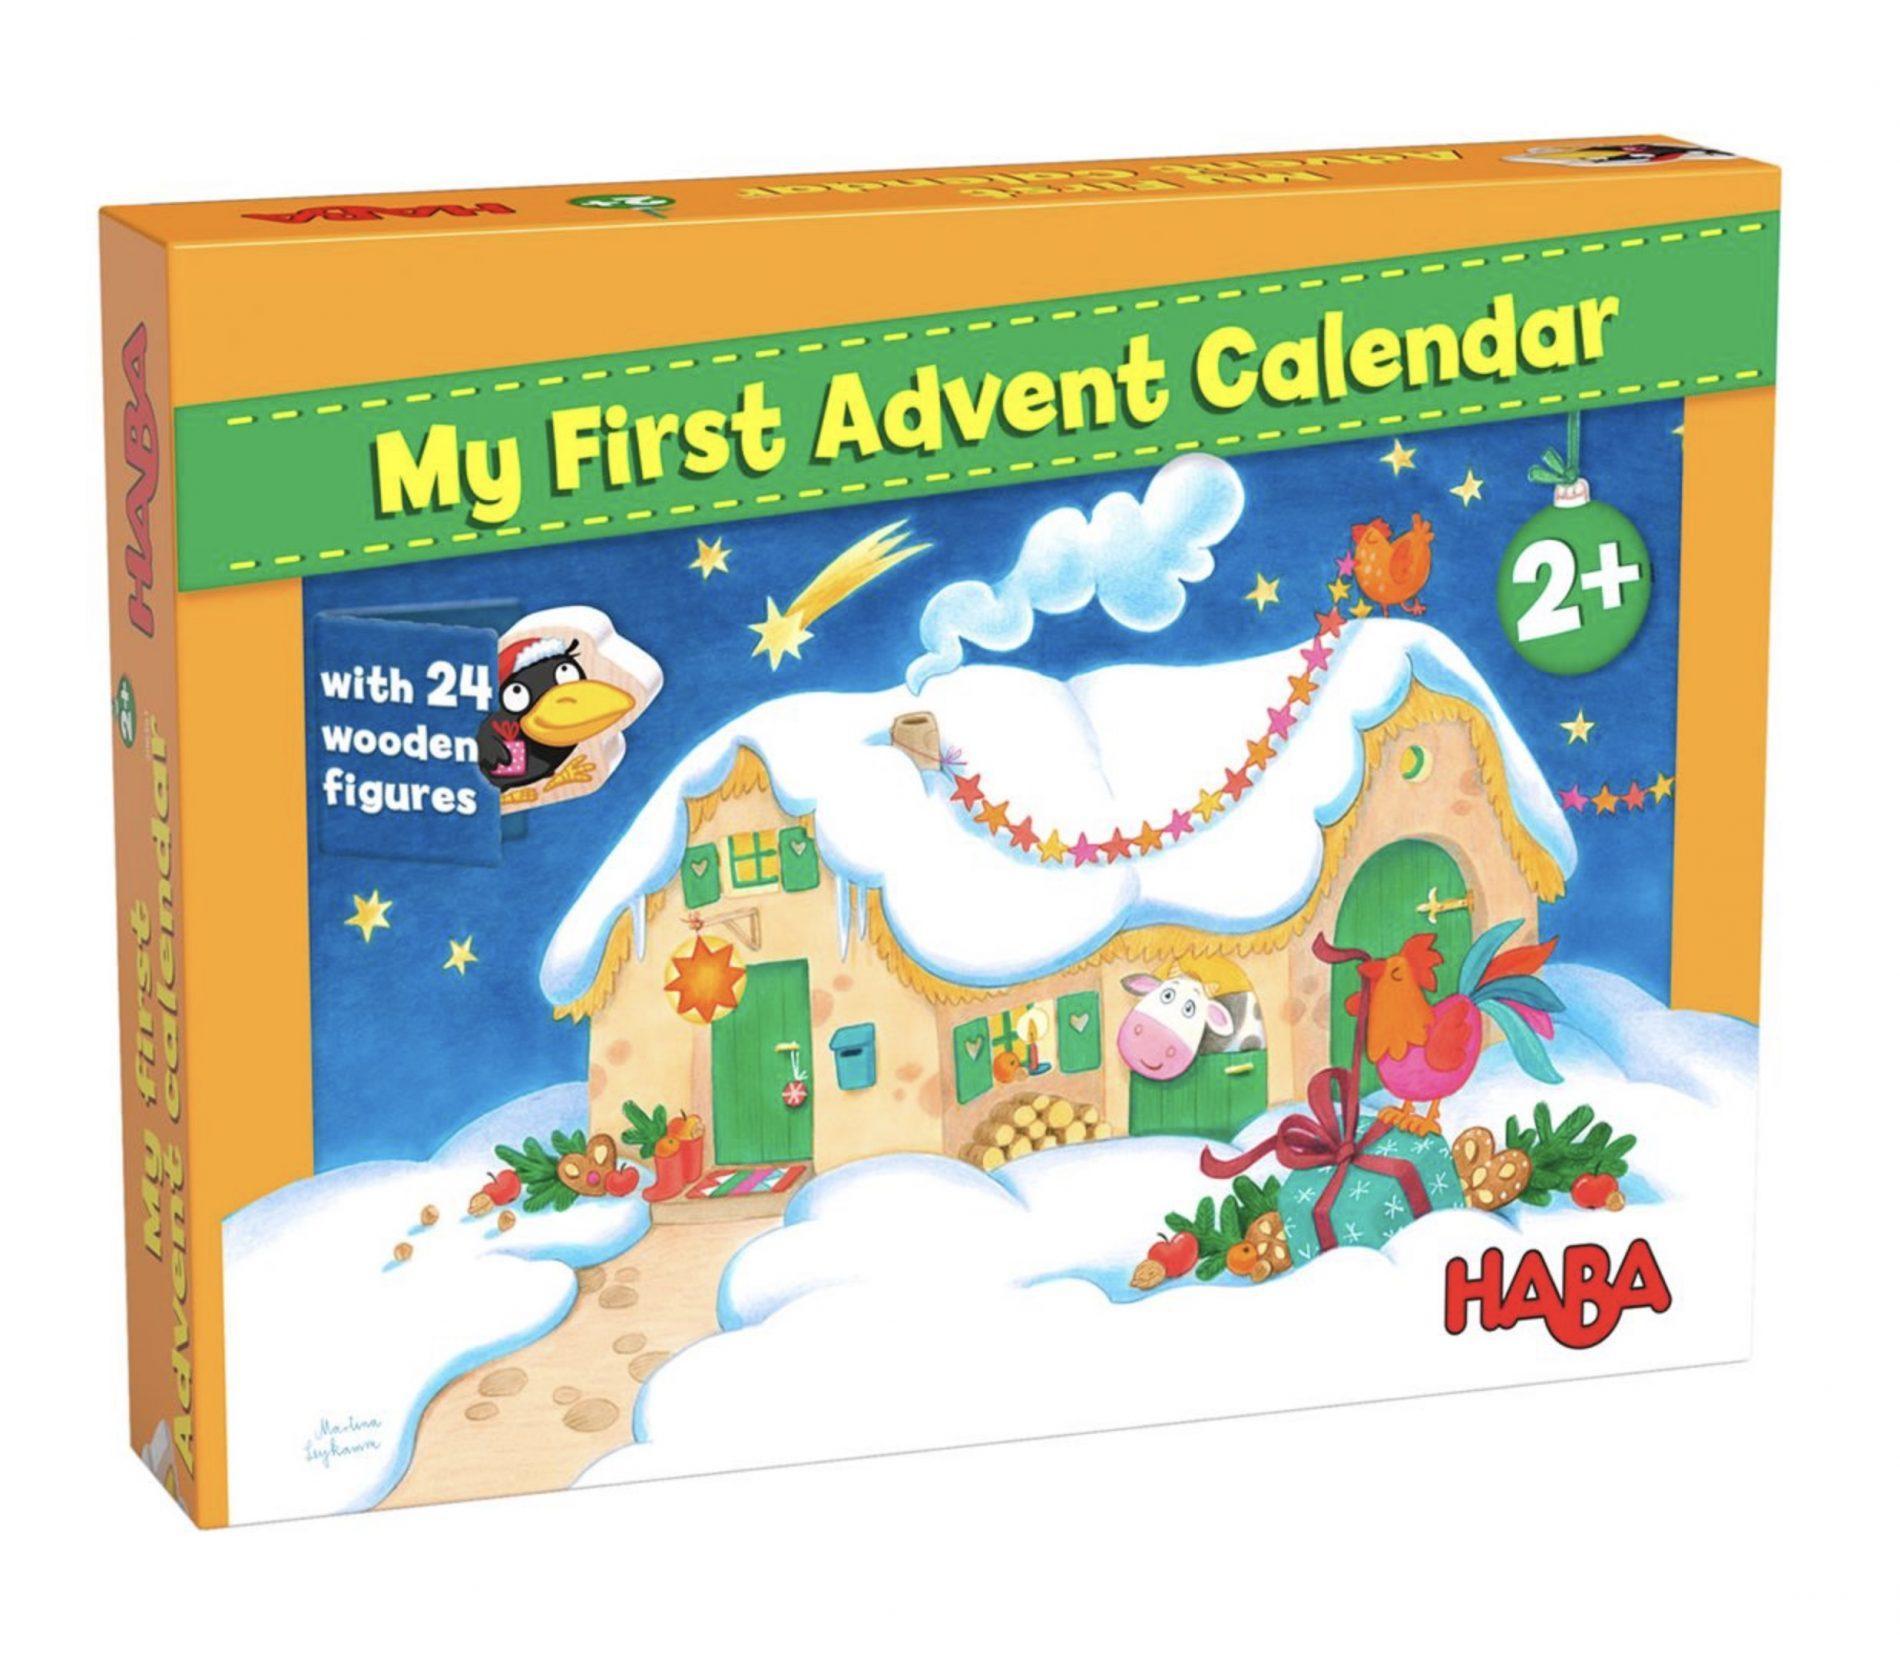 HABA My First Advent Calendar – Now Available